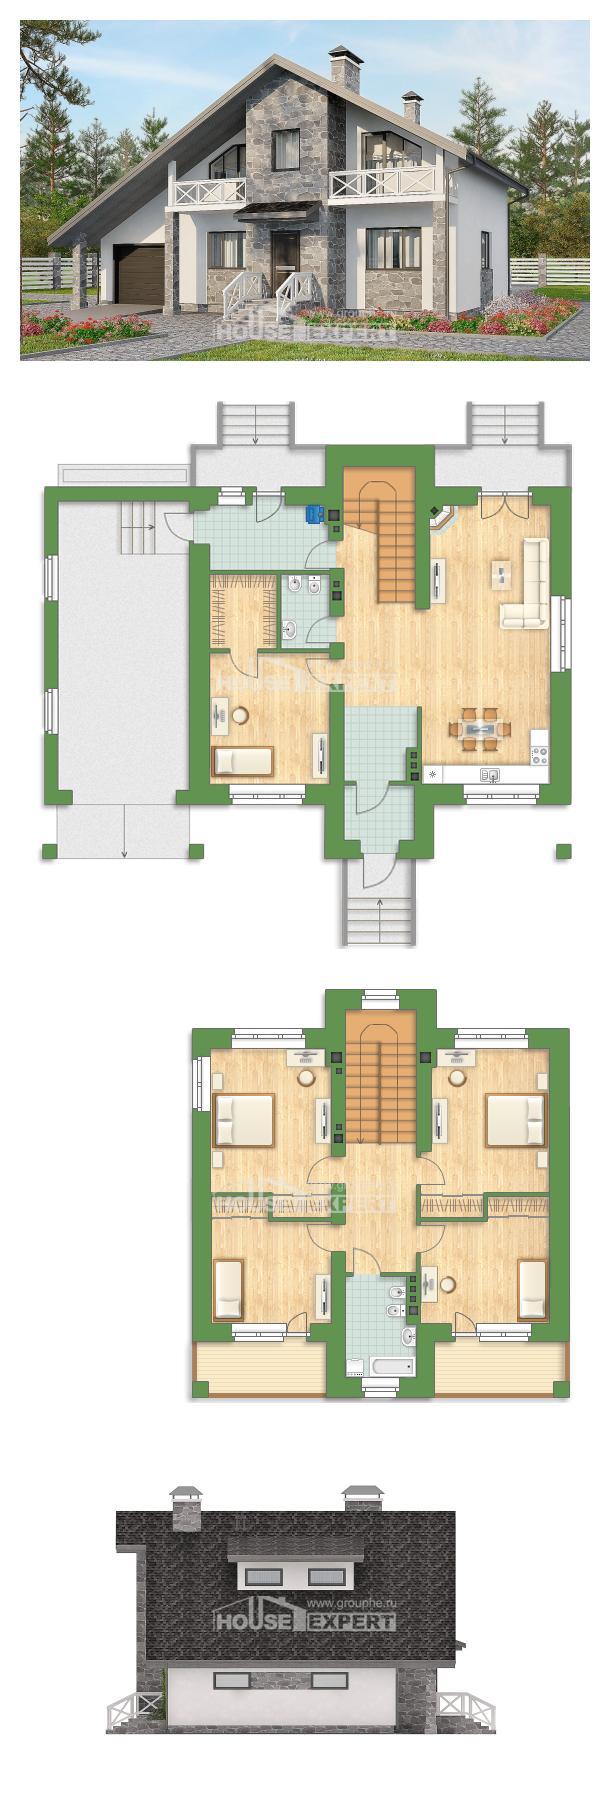 Ev villa projesi 180-017-L | House Expert